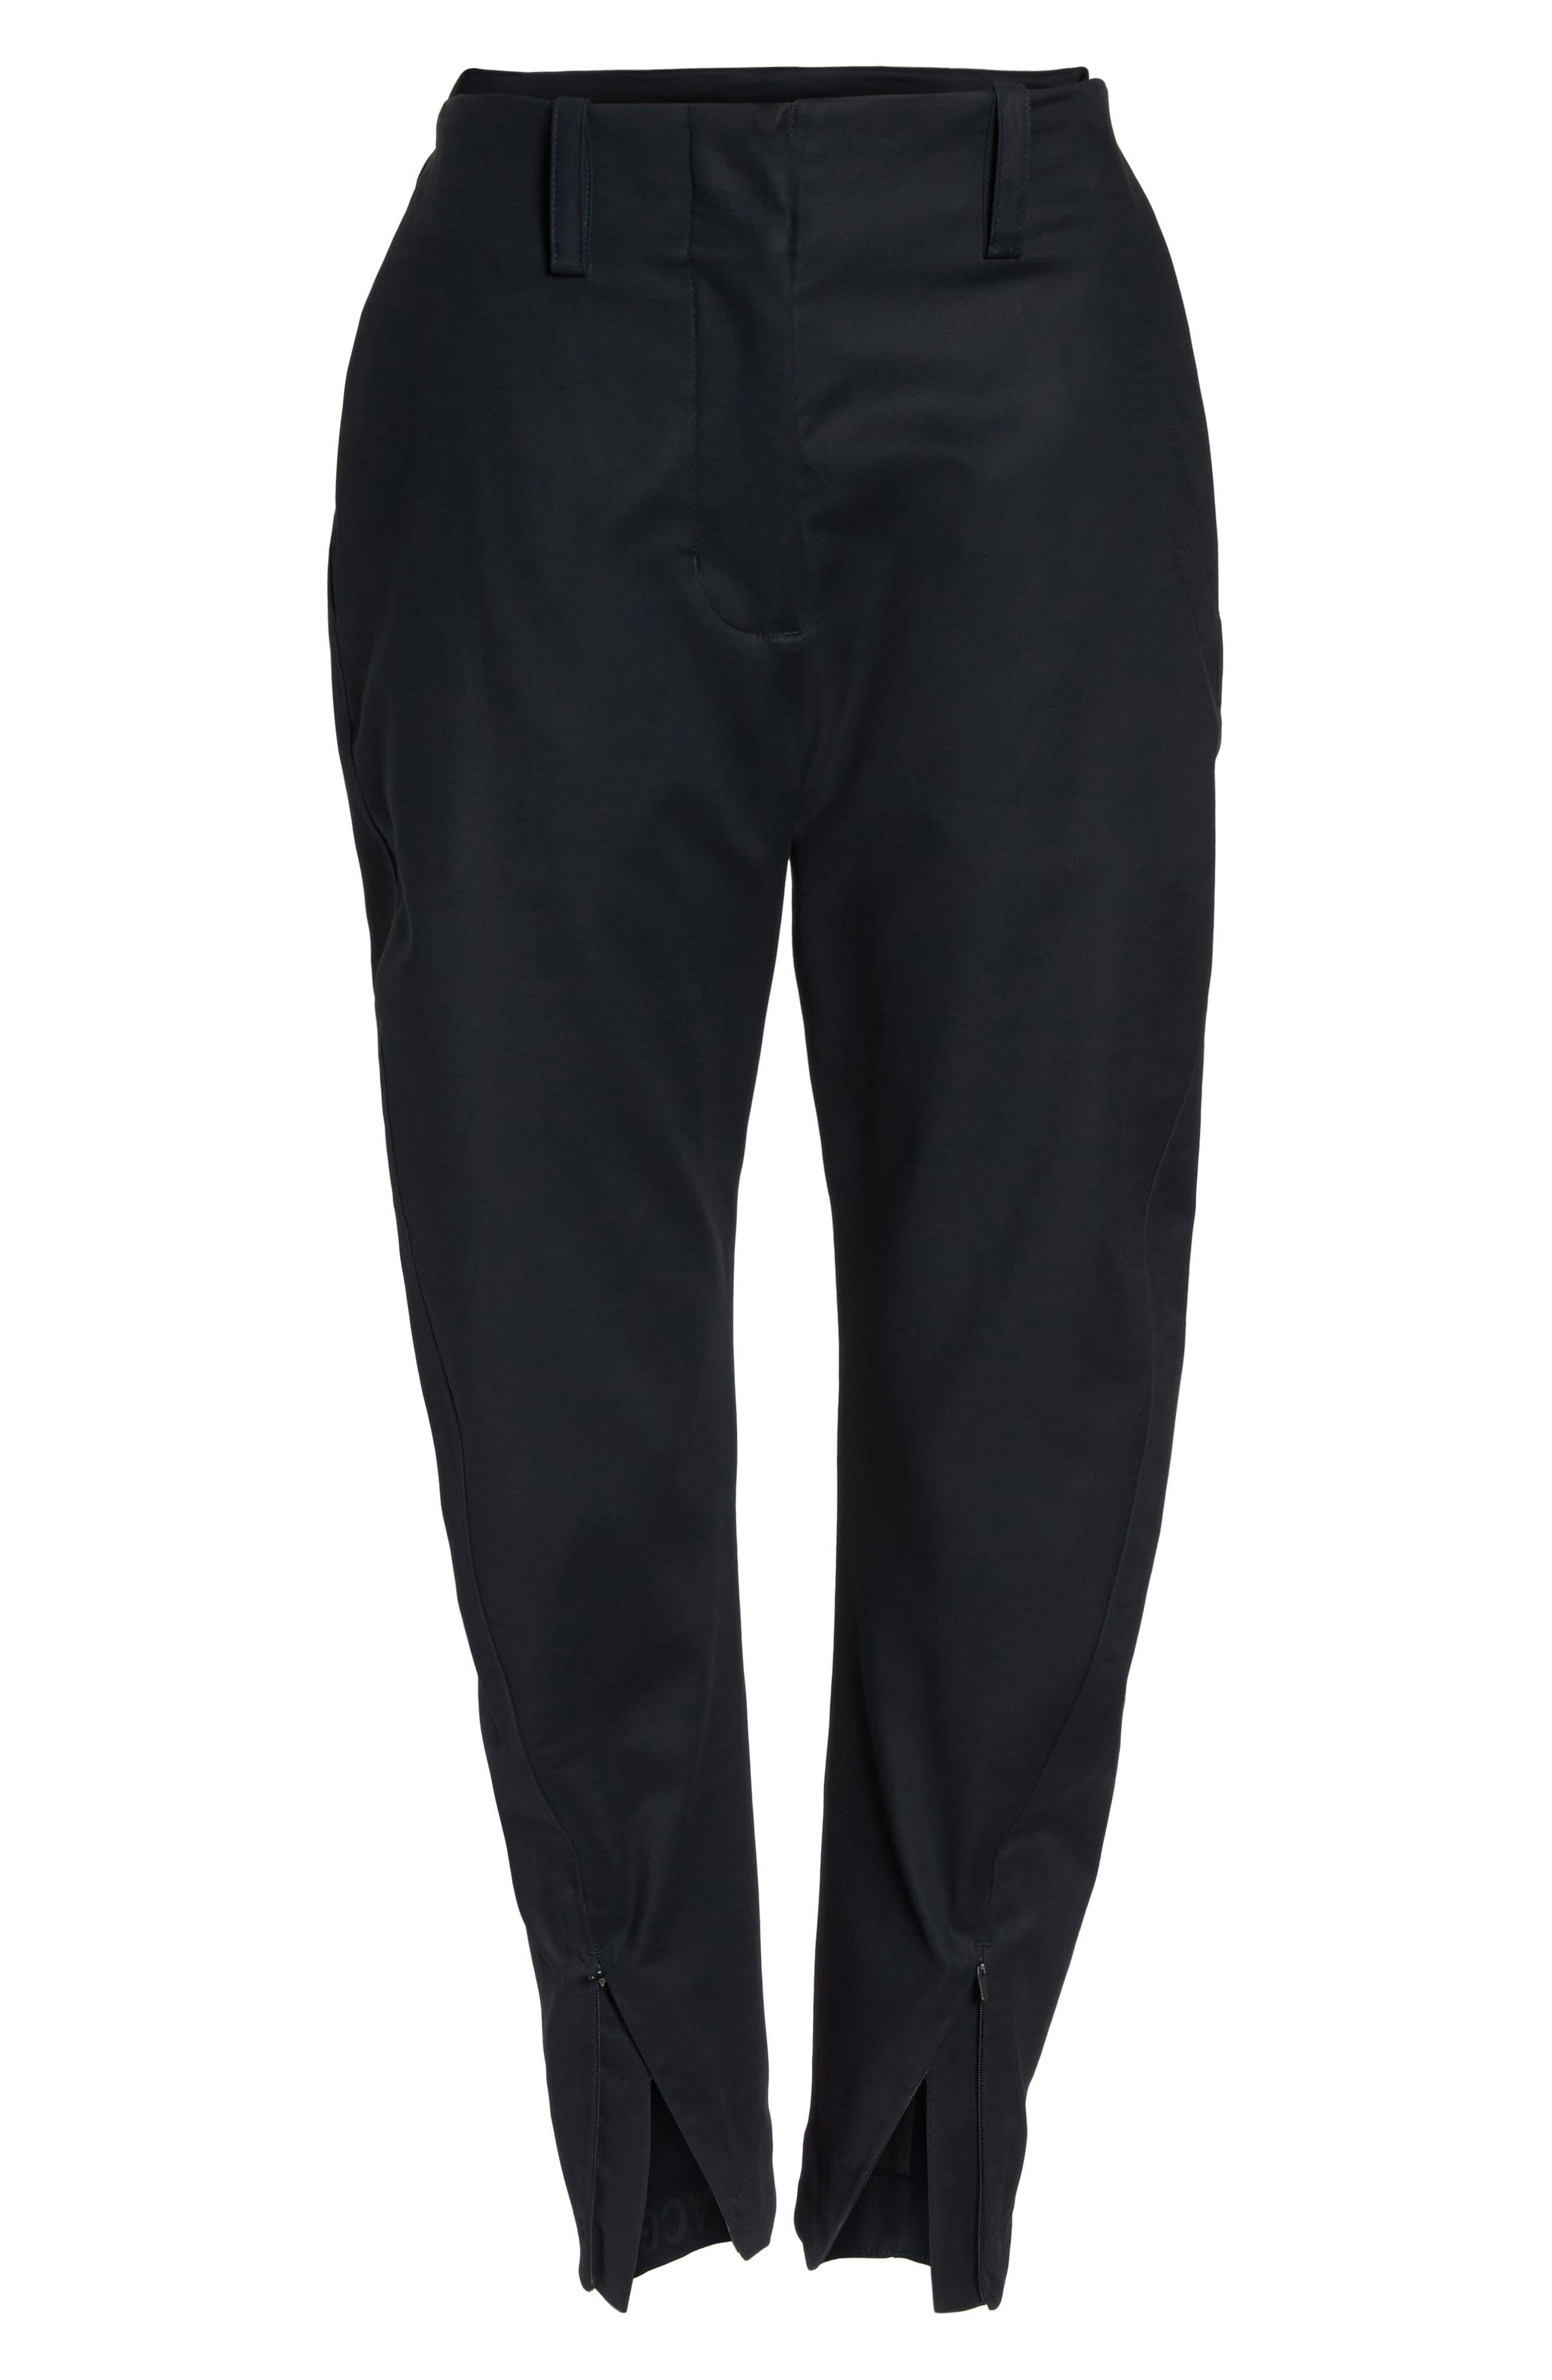 NikeLab ACG Tech Woven Pants,                             Alternate thumbnail 7, color,                             Black